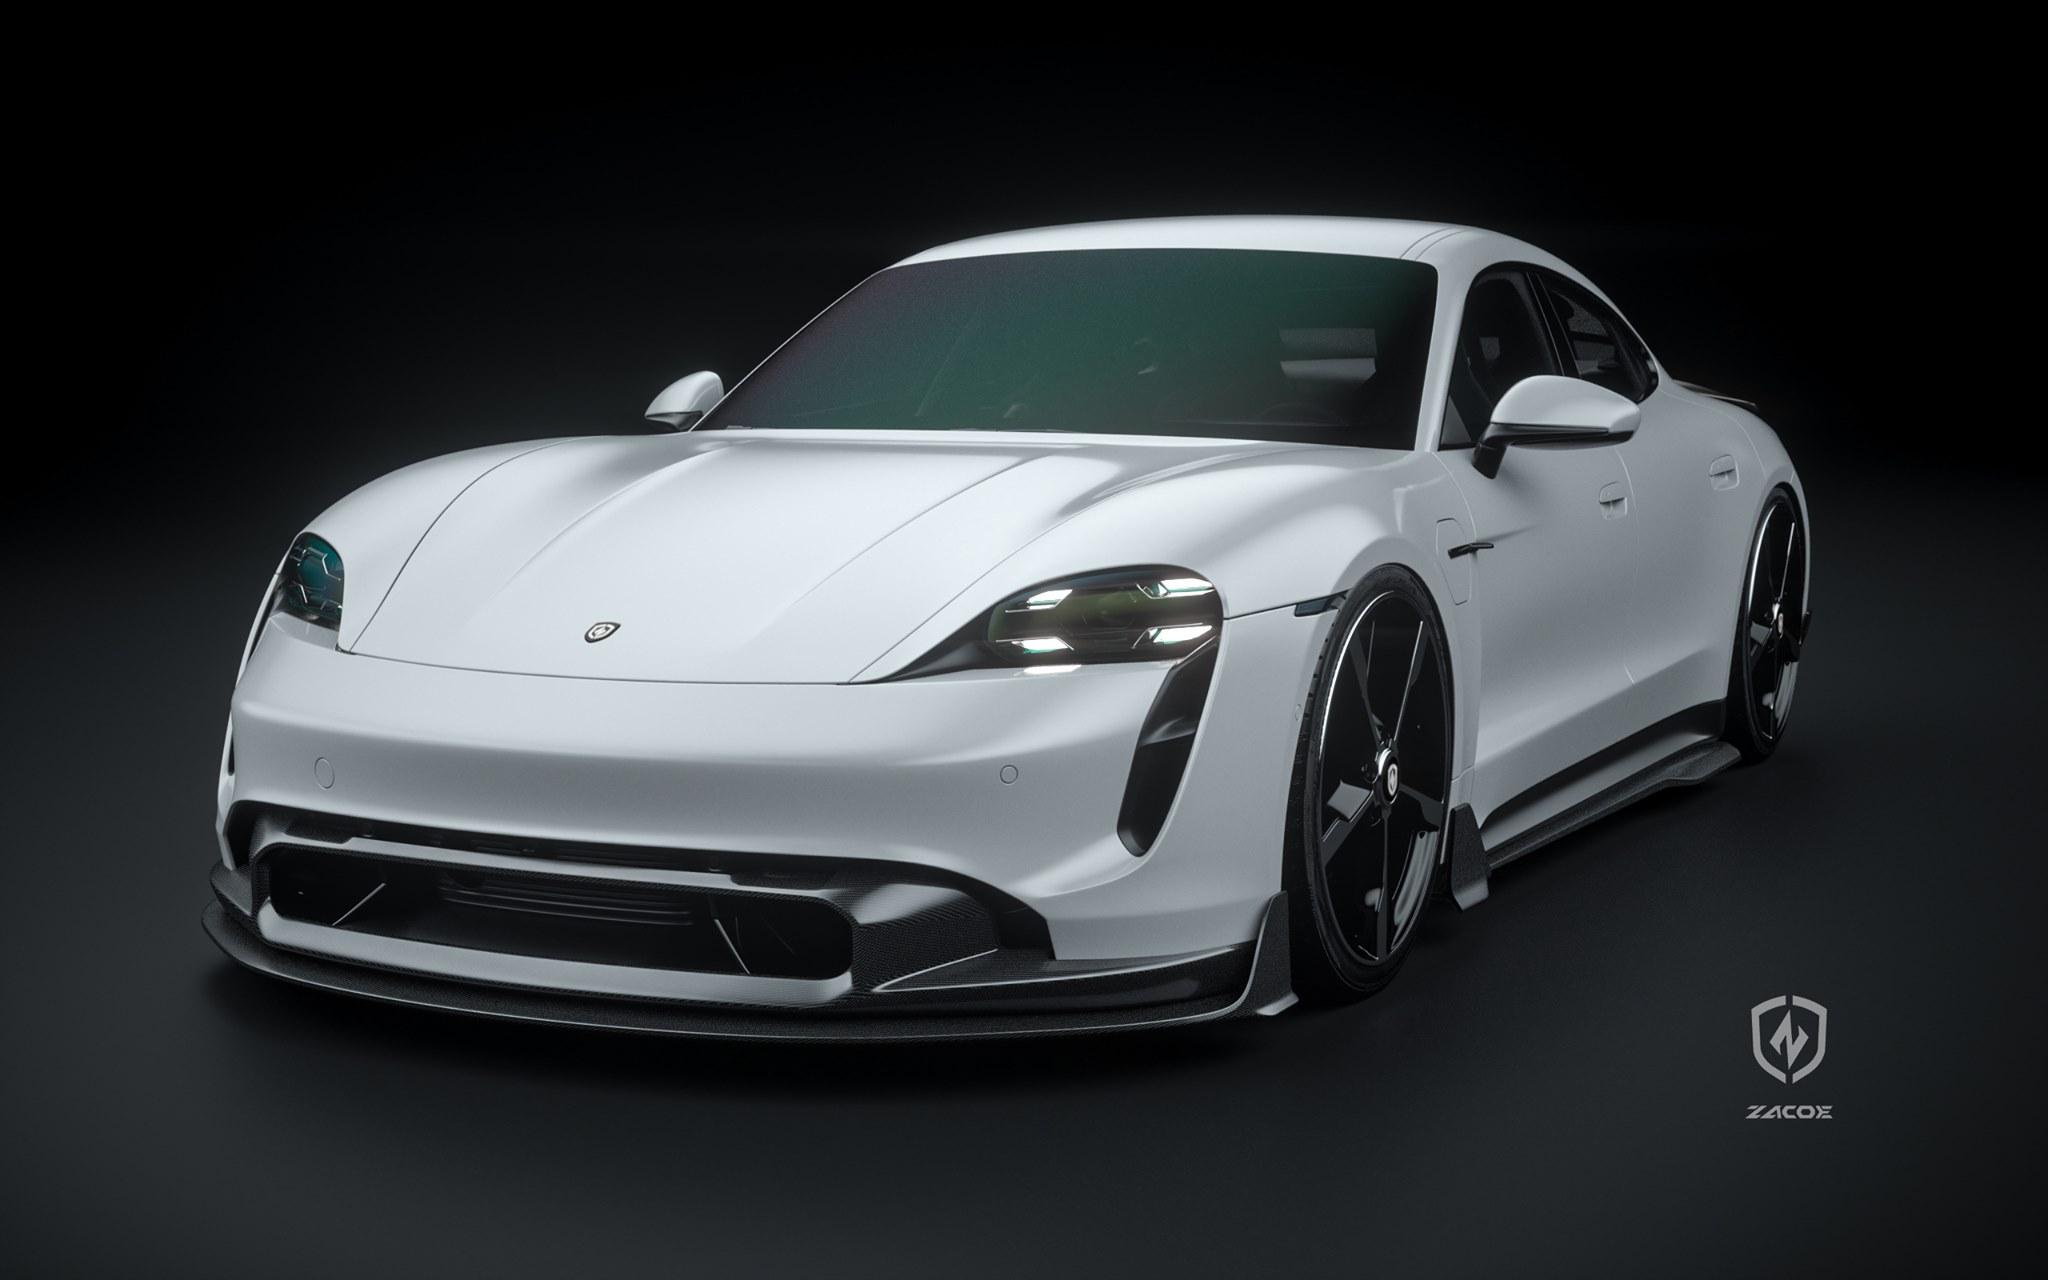 Porsche-Taycan-by-Zacoe-1